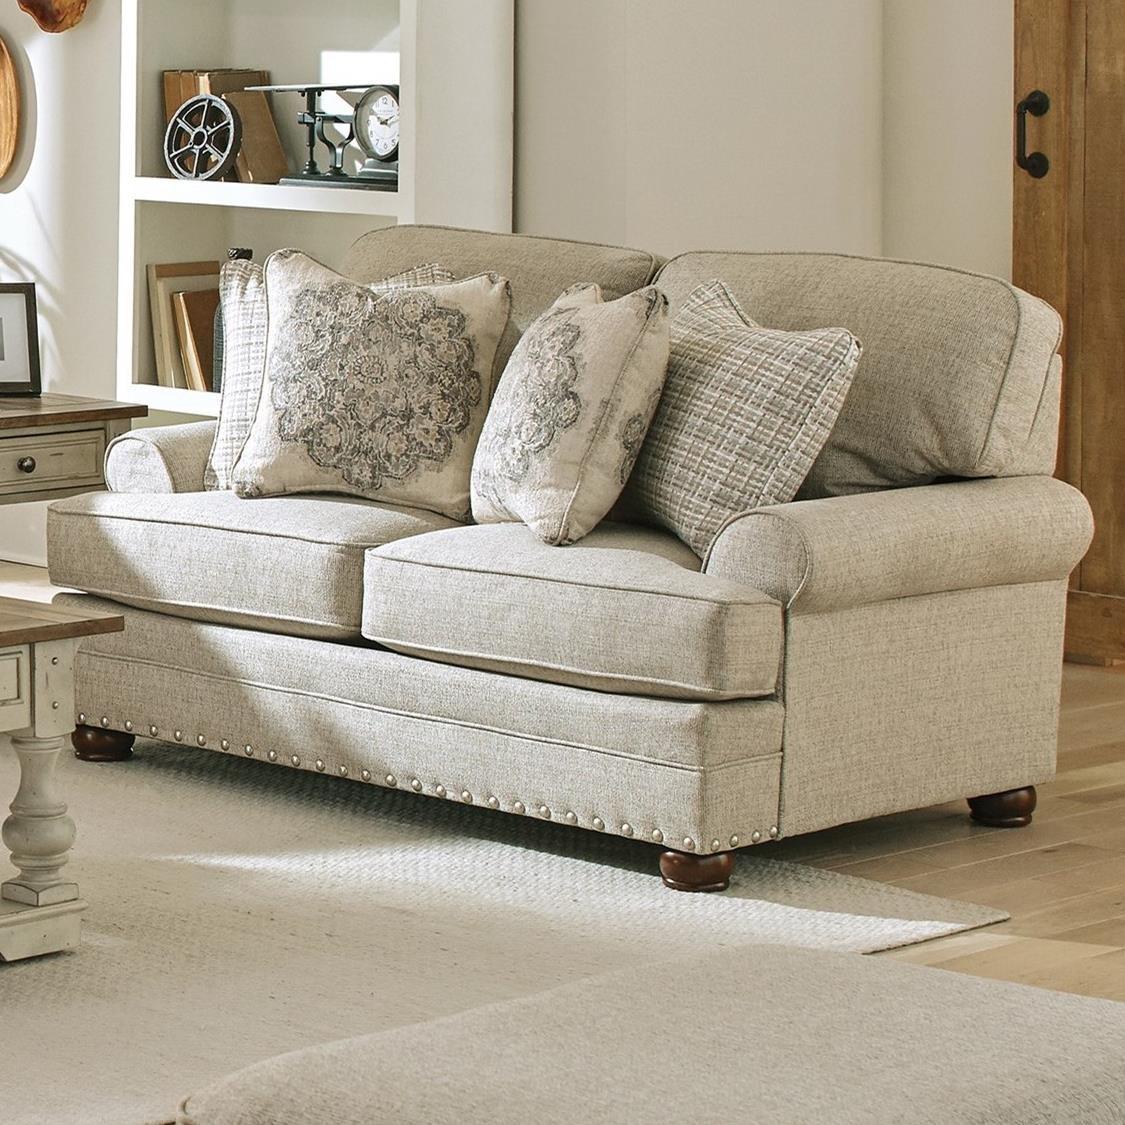 Farmington Loveseat by Jackson Furniture at Northeast Factory Direct